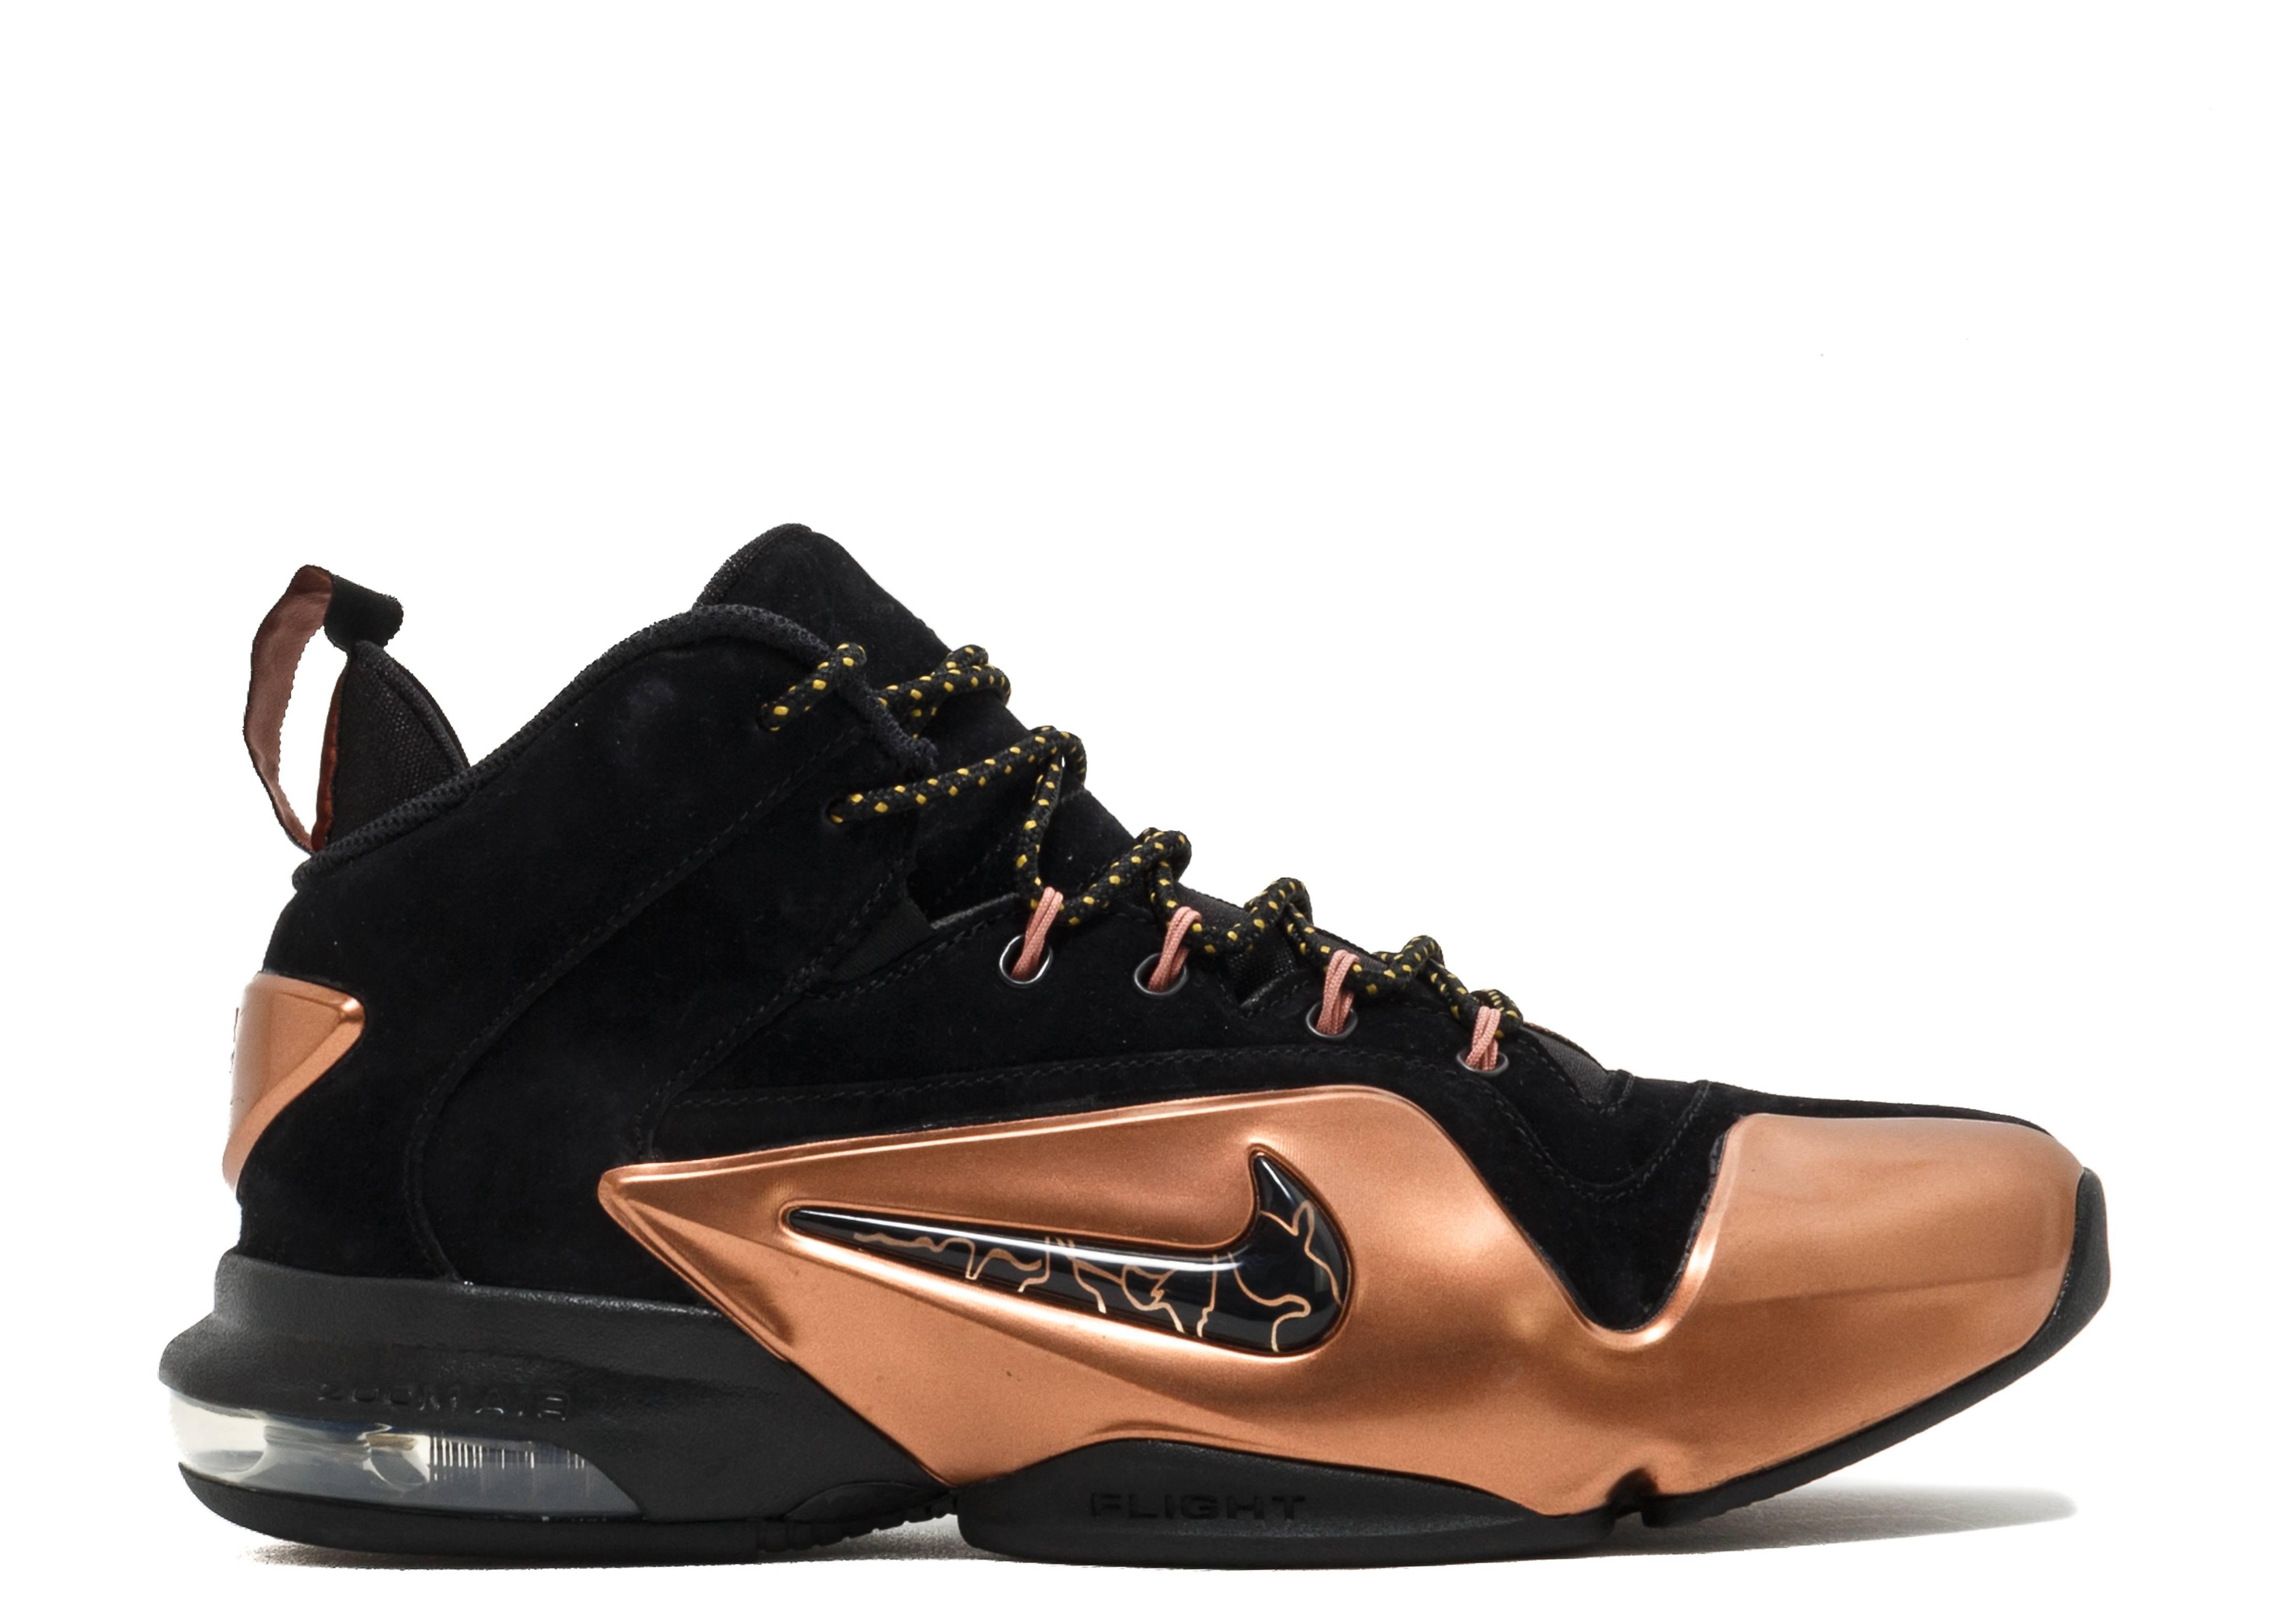 0acdafe542f6 Zoom Penny VI - Nike - 749629 001 - black black metallic copper ...